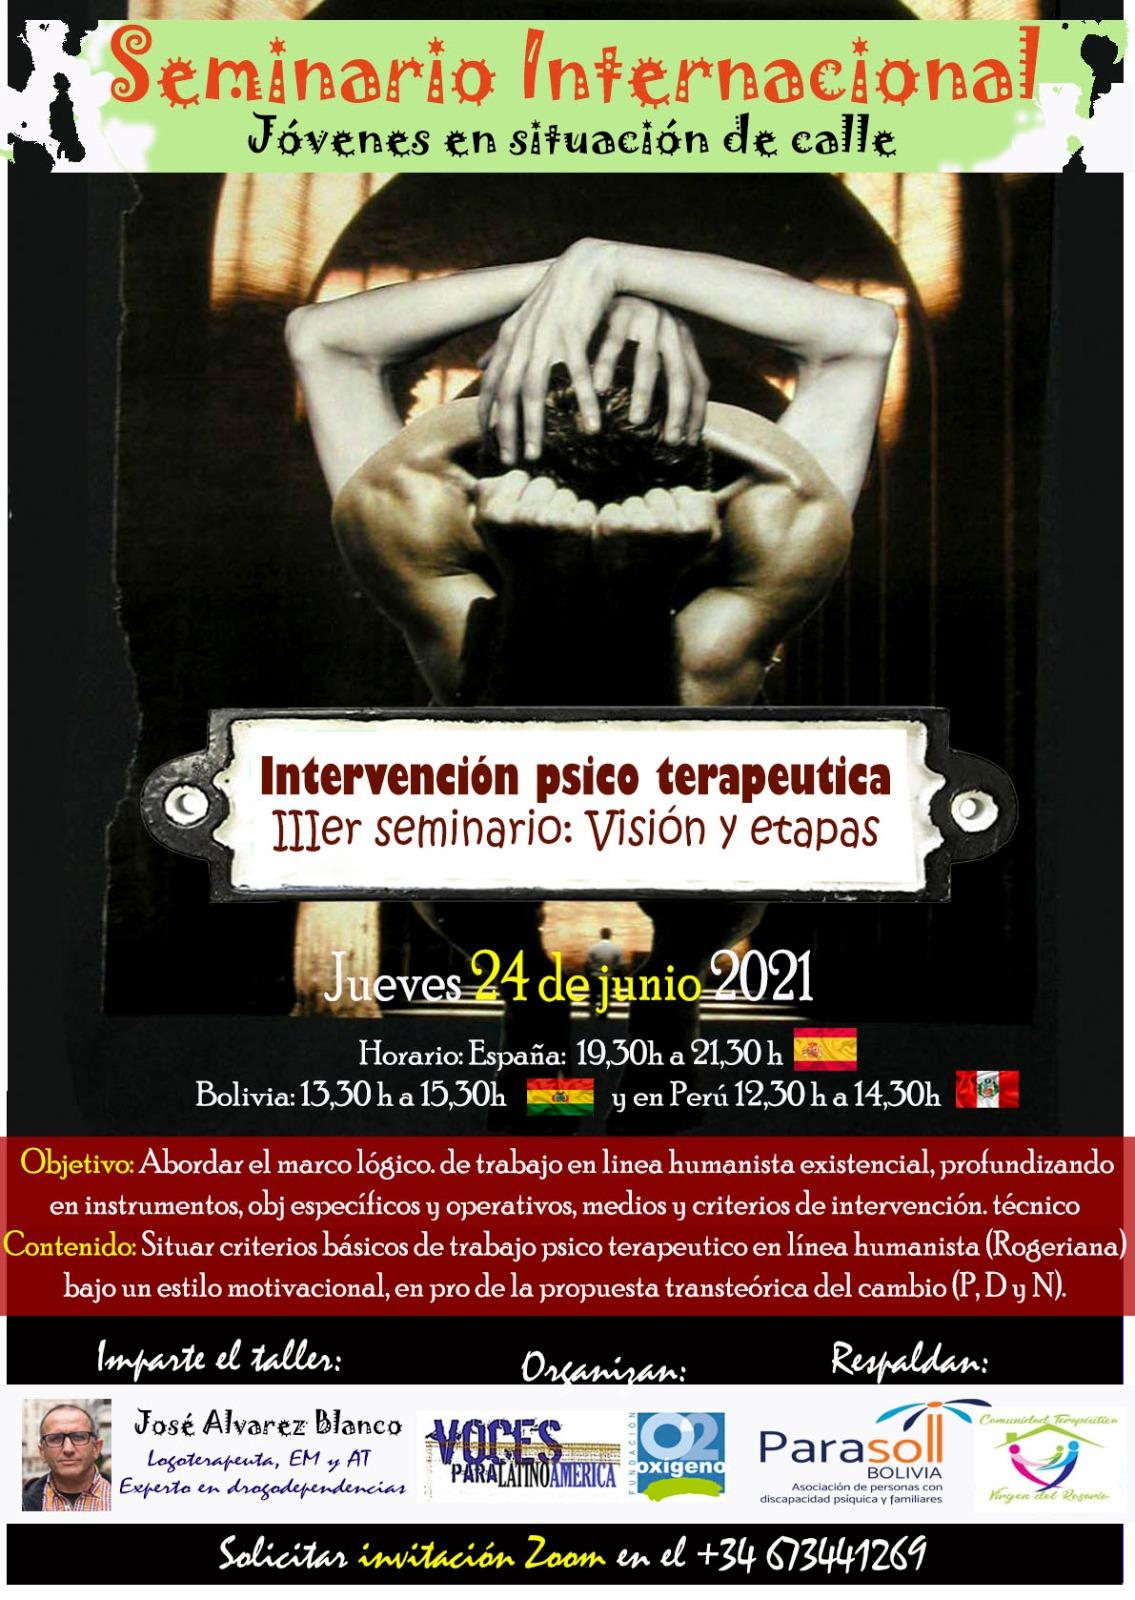 3 seminario intervencion terapeutica